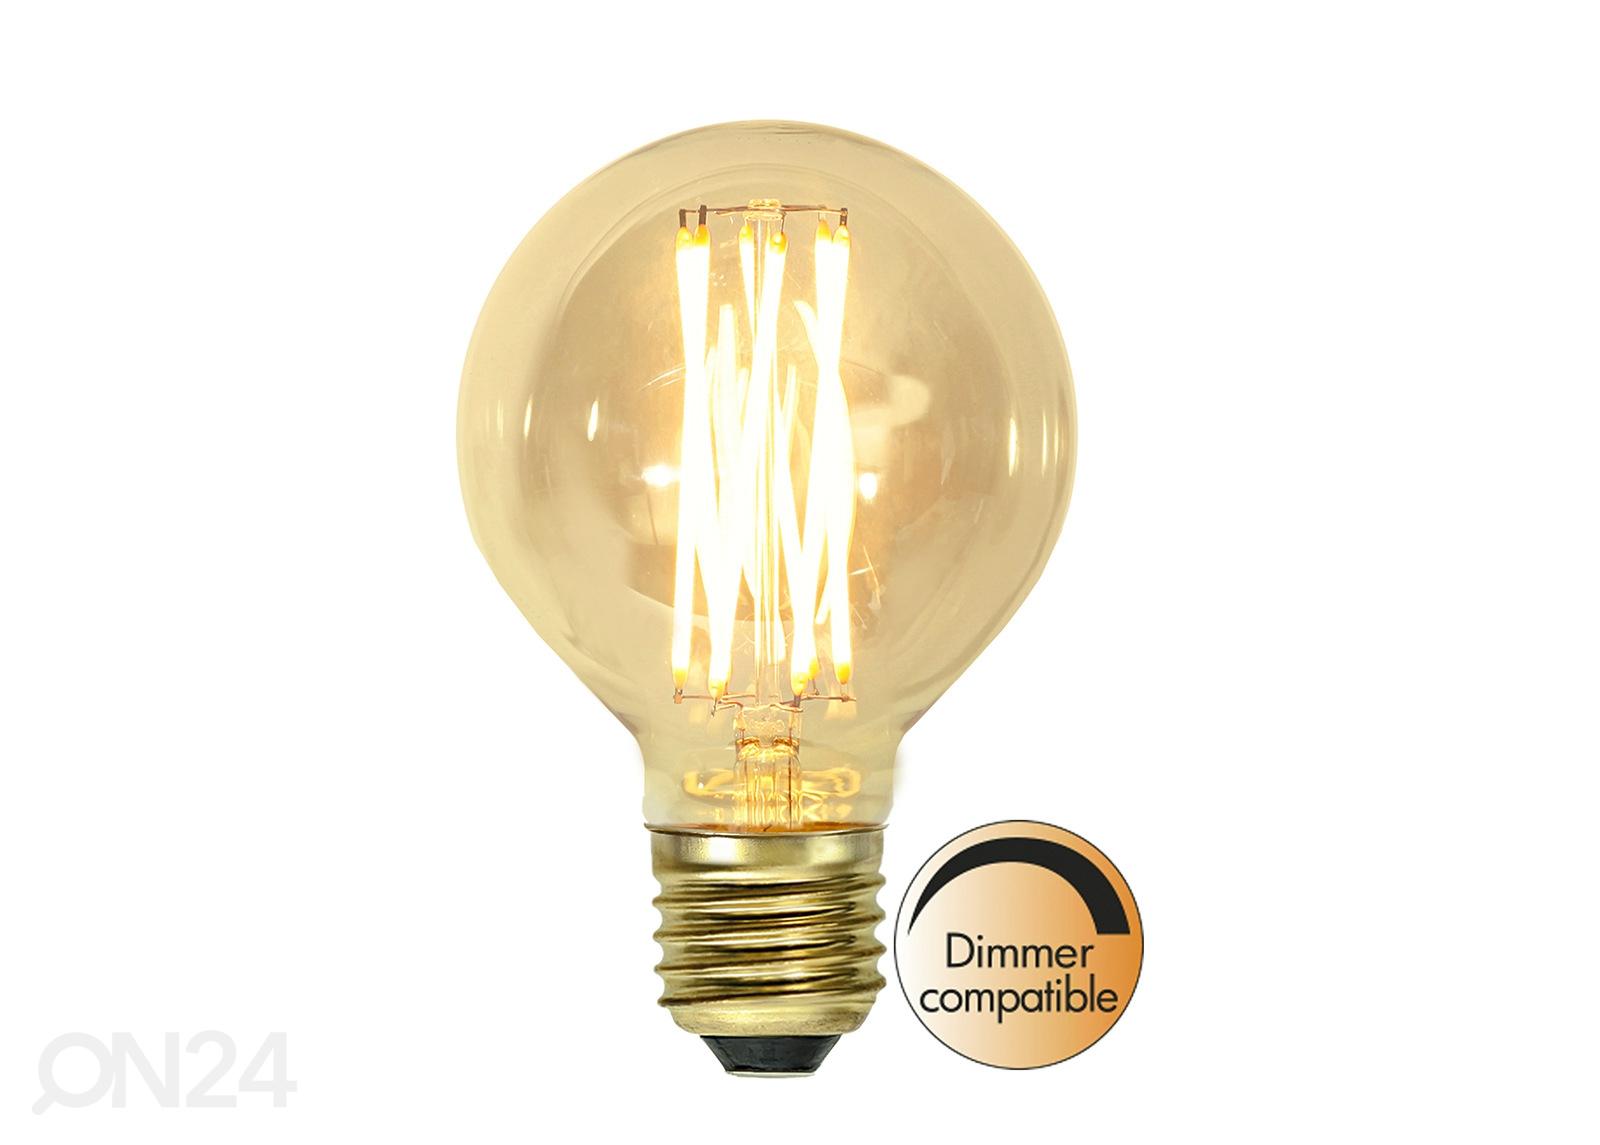 15e0678ebe8 Dekoratiivne LED pirn E27 3,7 W AA-152763 - ON24 Sisustuskaubamaja